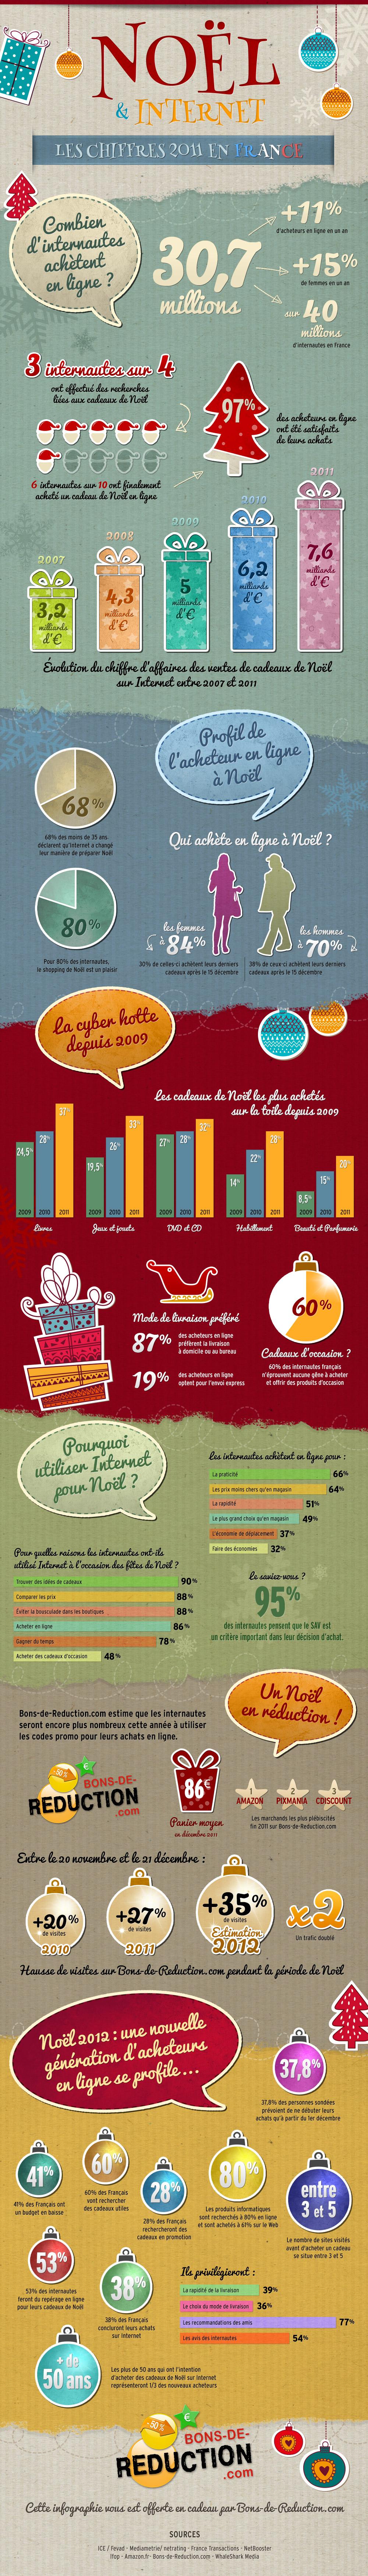 infographie_noel_hd